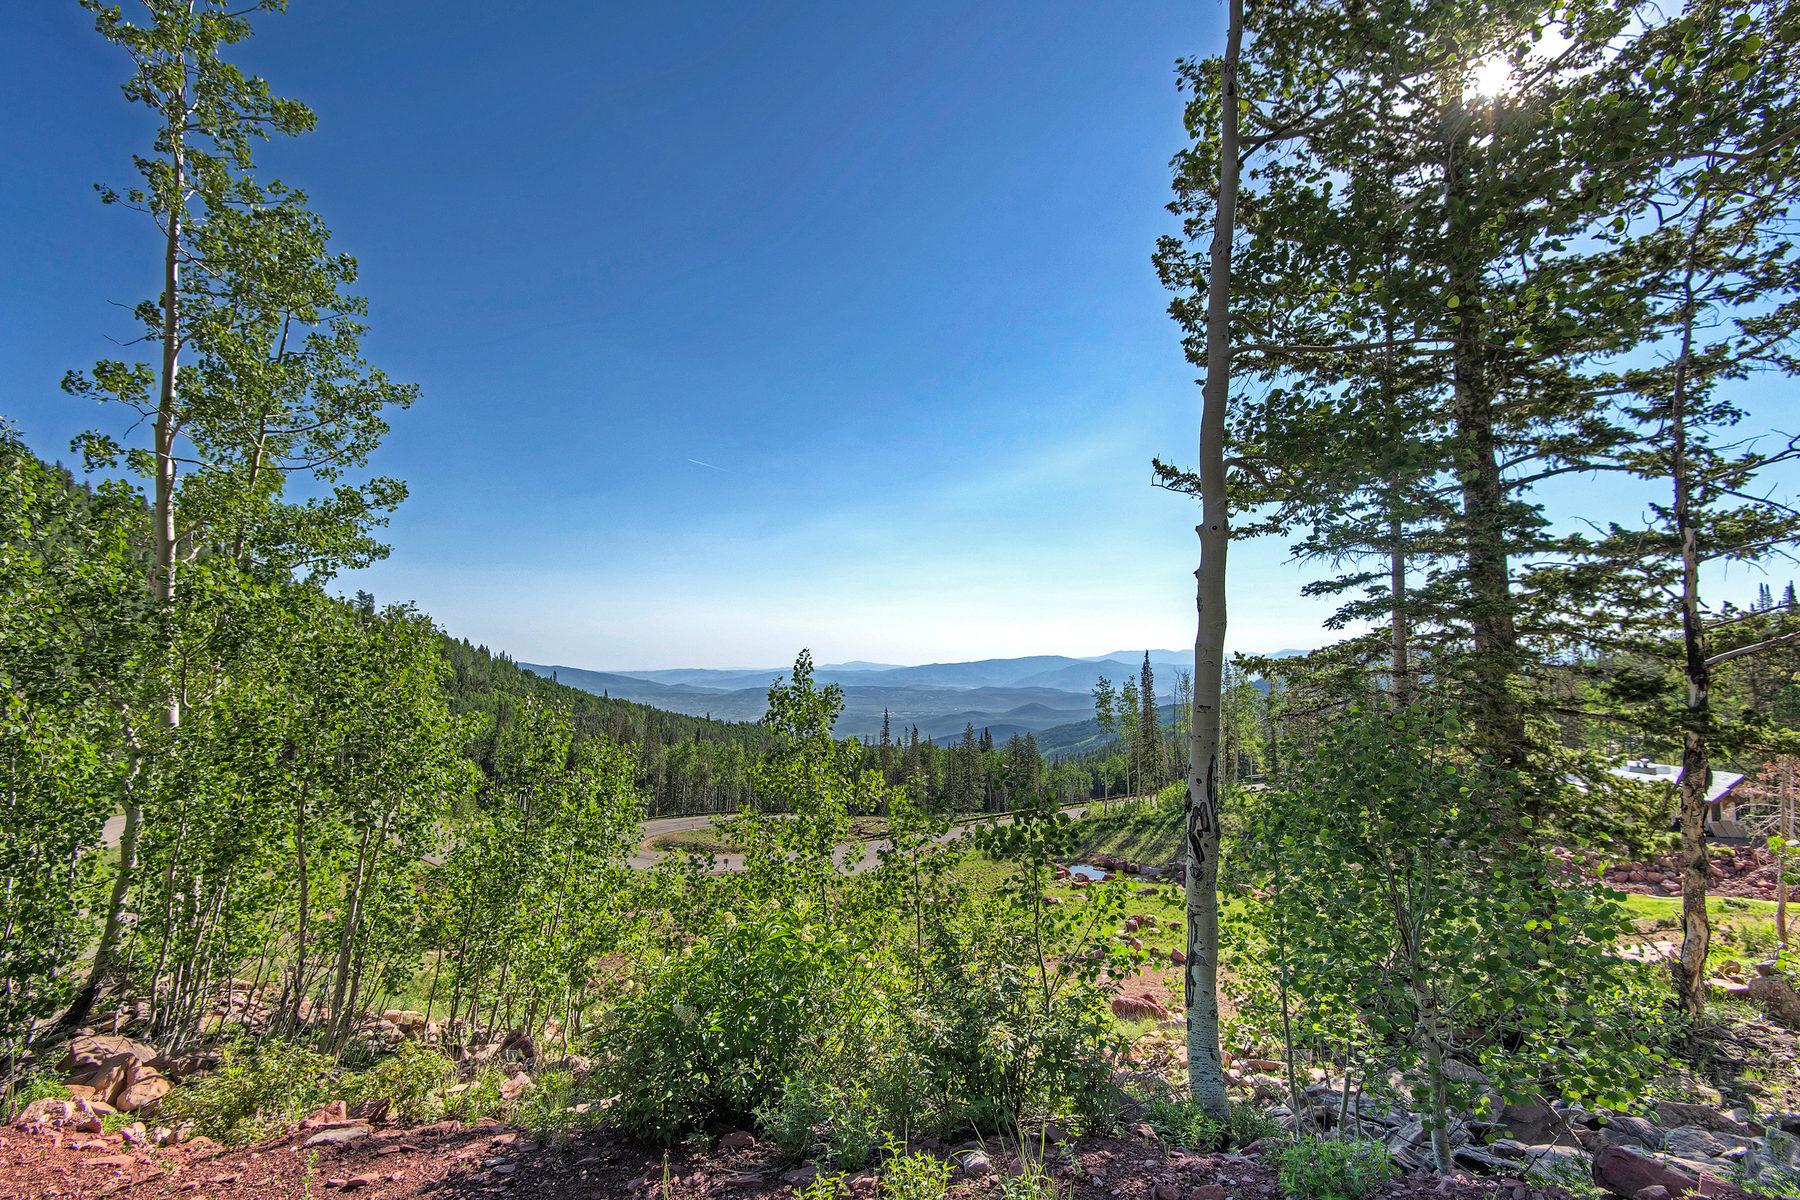 Terreno para Venda às Top of The Colony, easy ski access, 15 acres, approved for horses 133 White Pine Canyon Rd Lot 127 Park City, Utah 84098 Estados Unidos